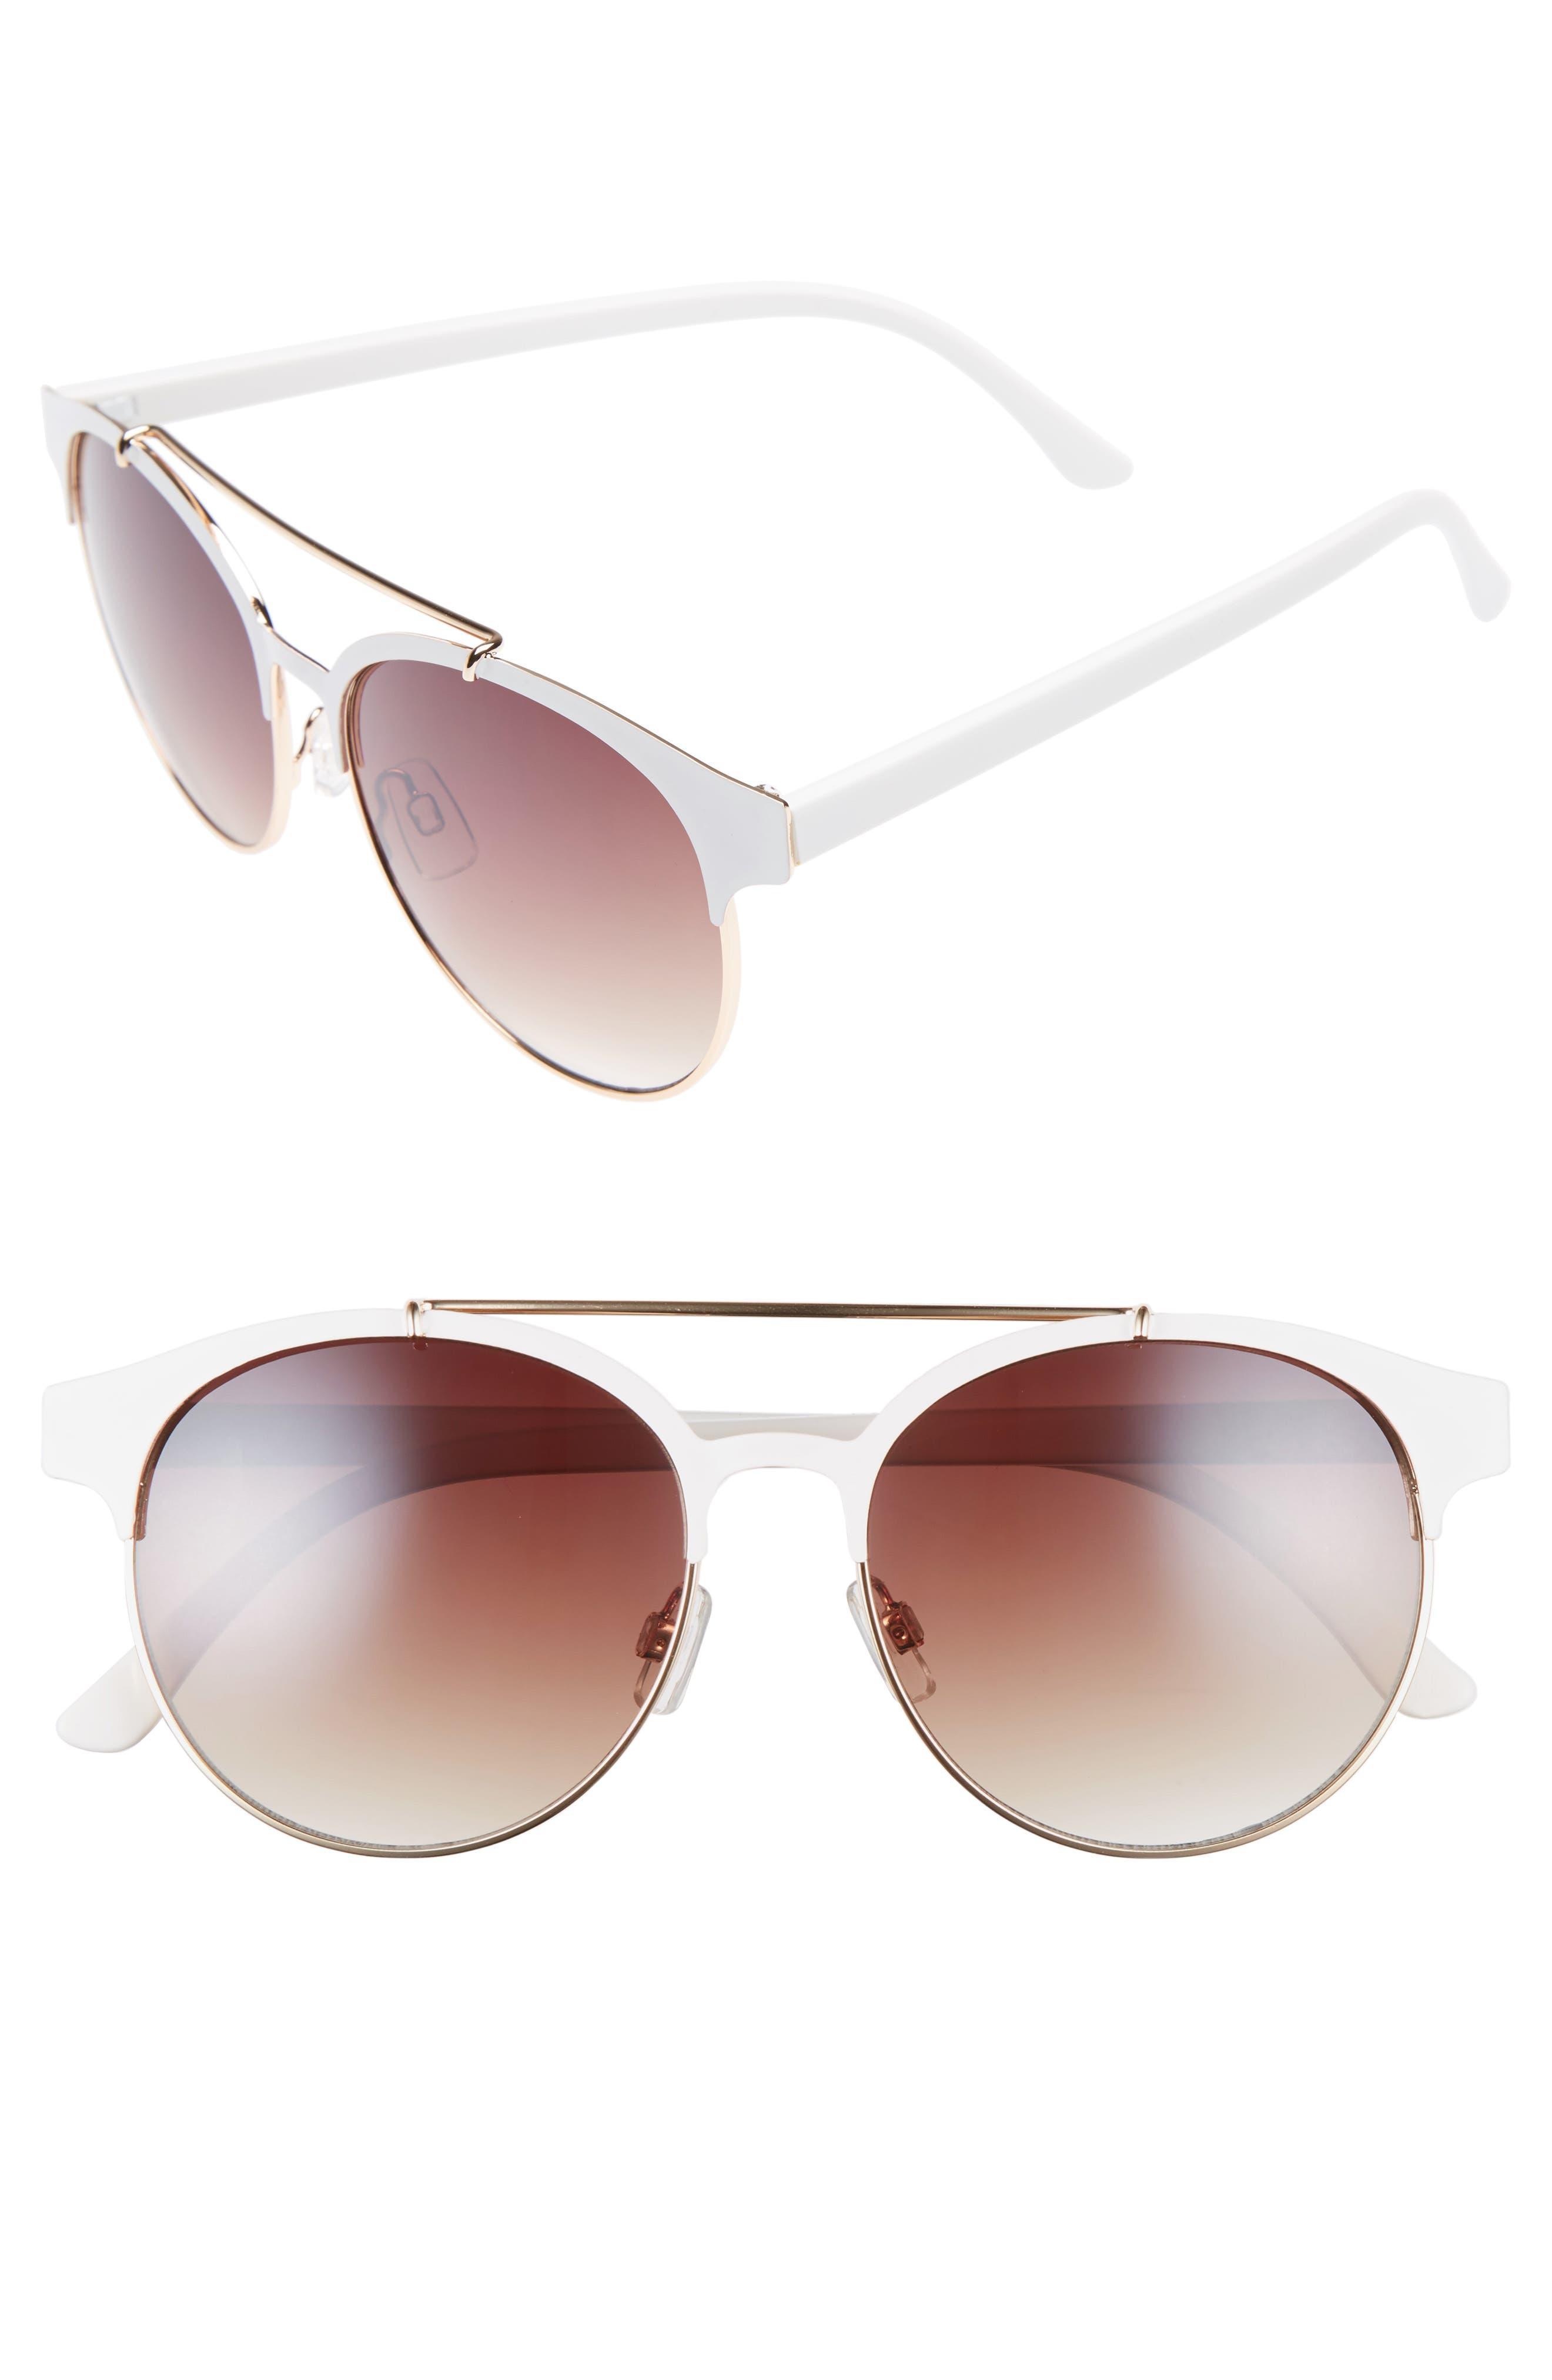 55mm Round Sunglasses,                             Main thumbnail 2, color,